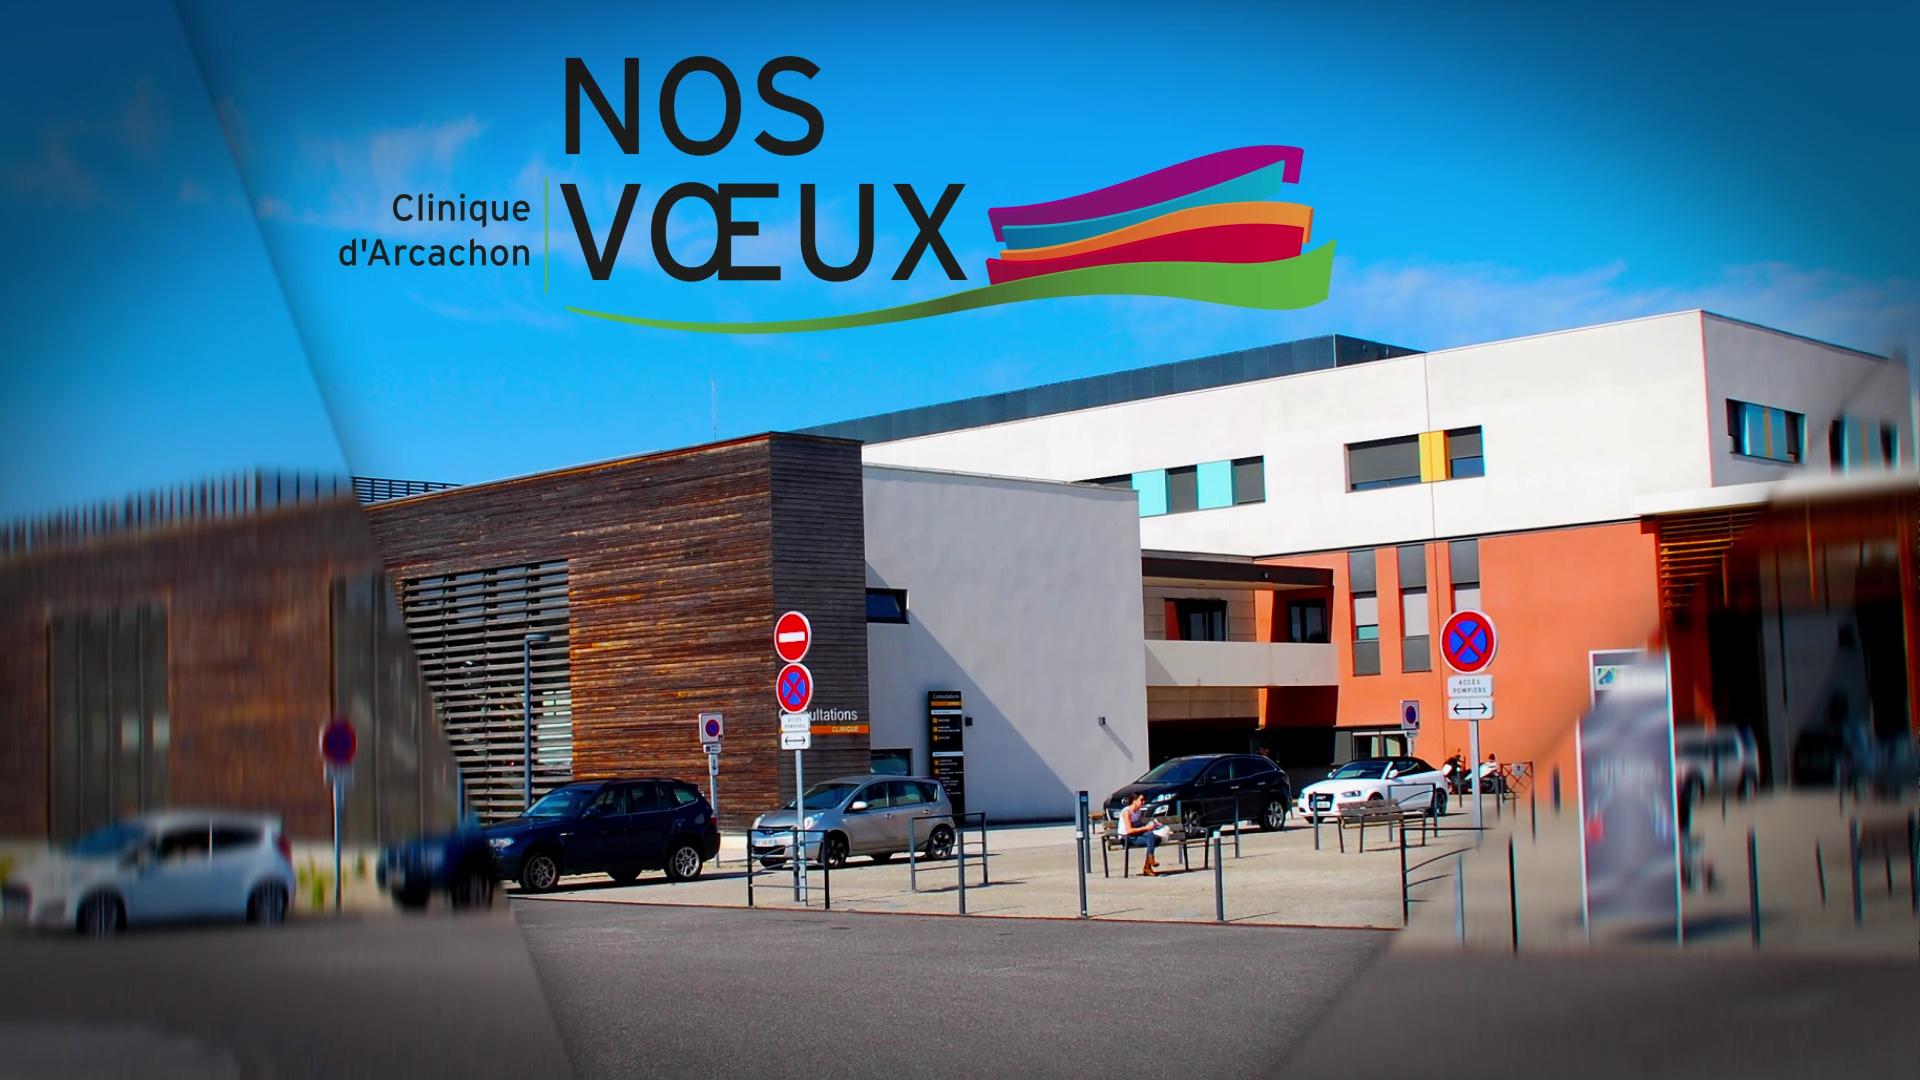 Clinique d'Arcachon – Vœux 2019